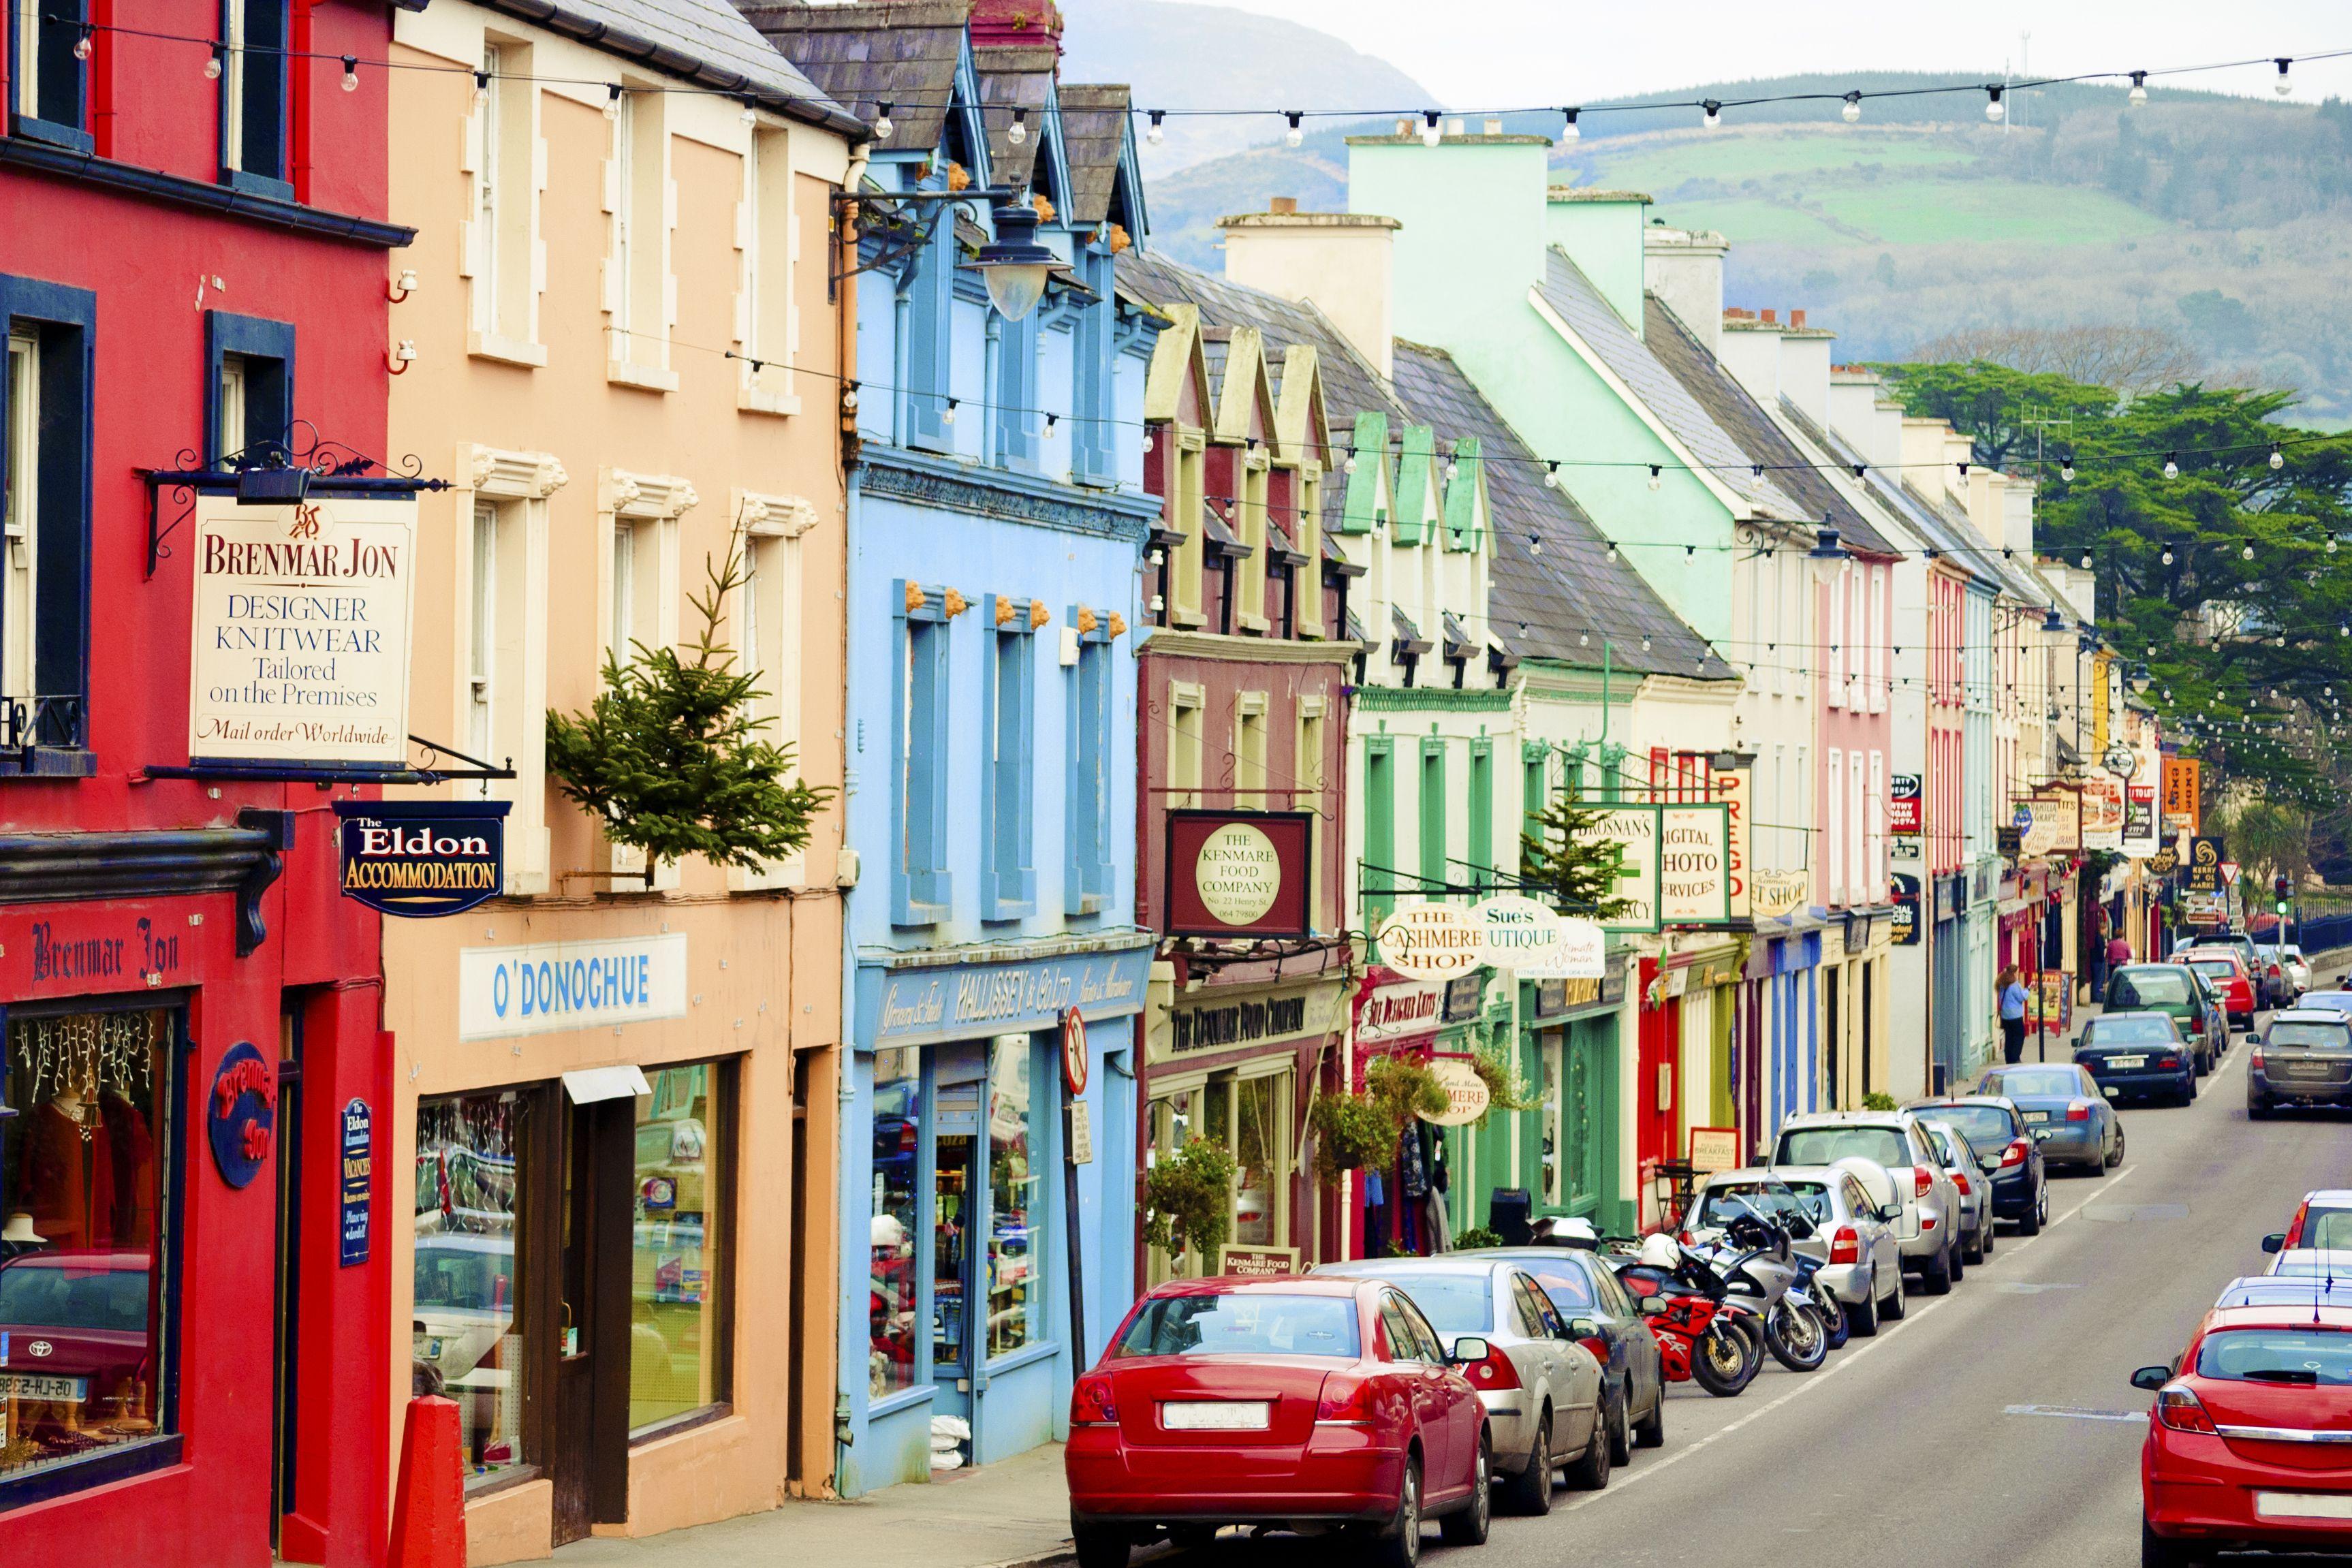 Kenmare dating site - free online dating in Kenmare (Ireland)